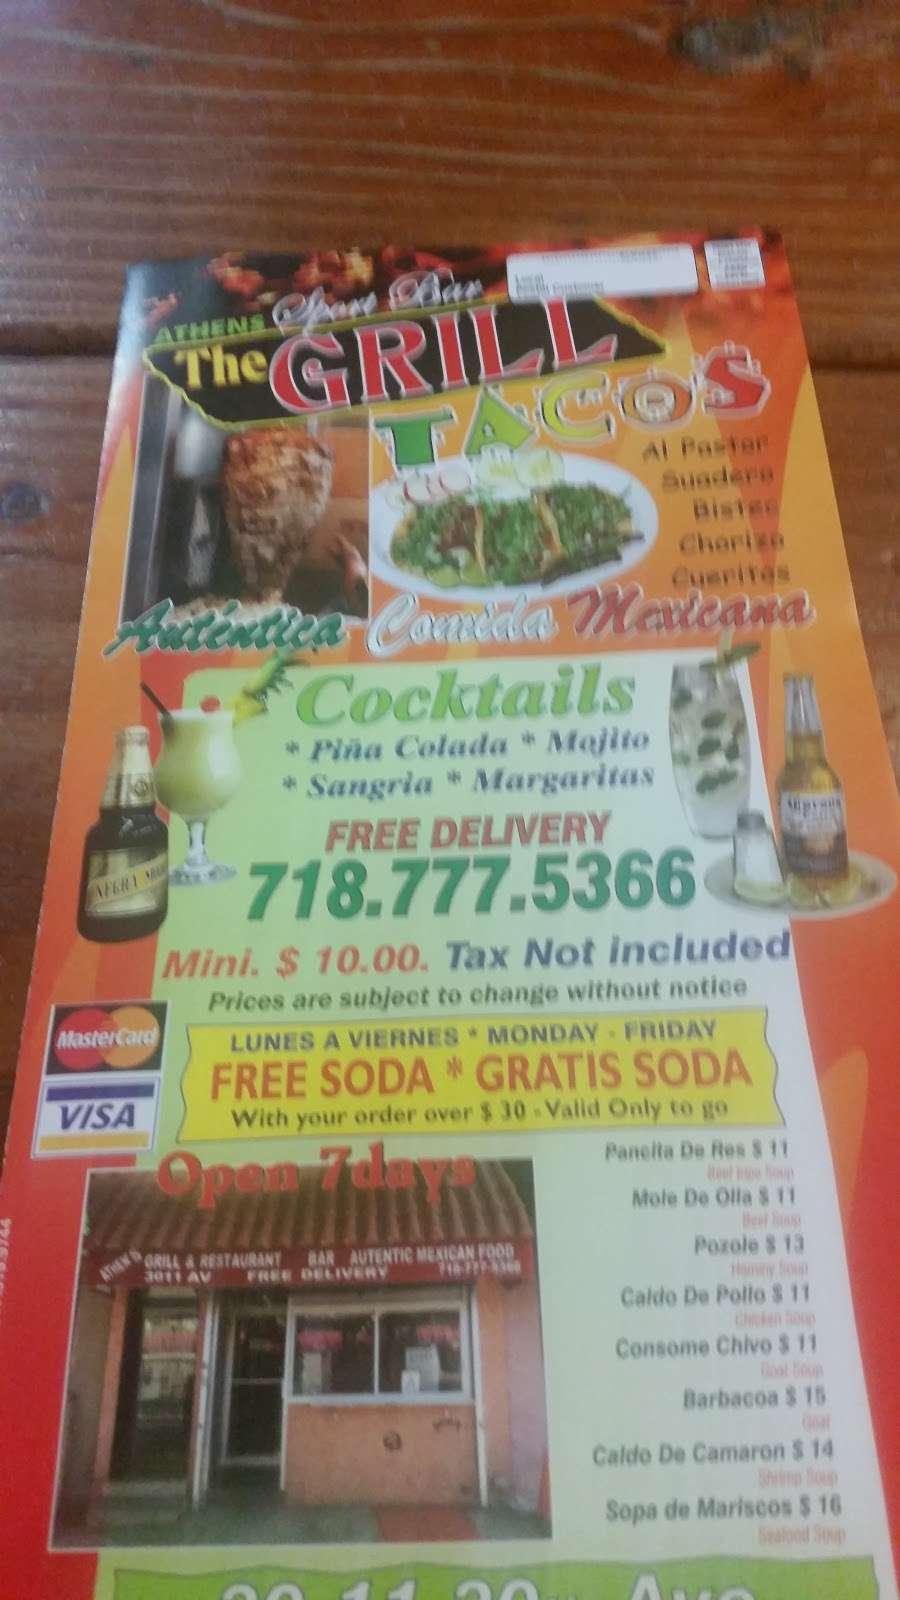 Athens - restaurant    Photo 6 of 8   Address: 30-11 30th Ave, Long Island City, NY 11102, USA   Phone: (718) 777-5366